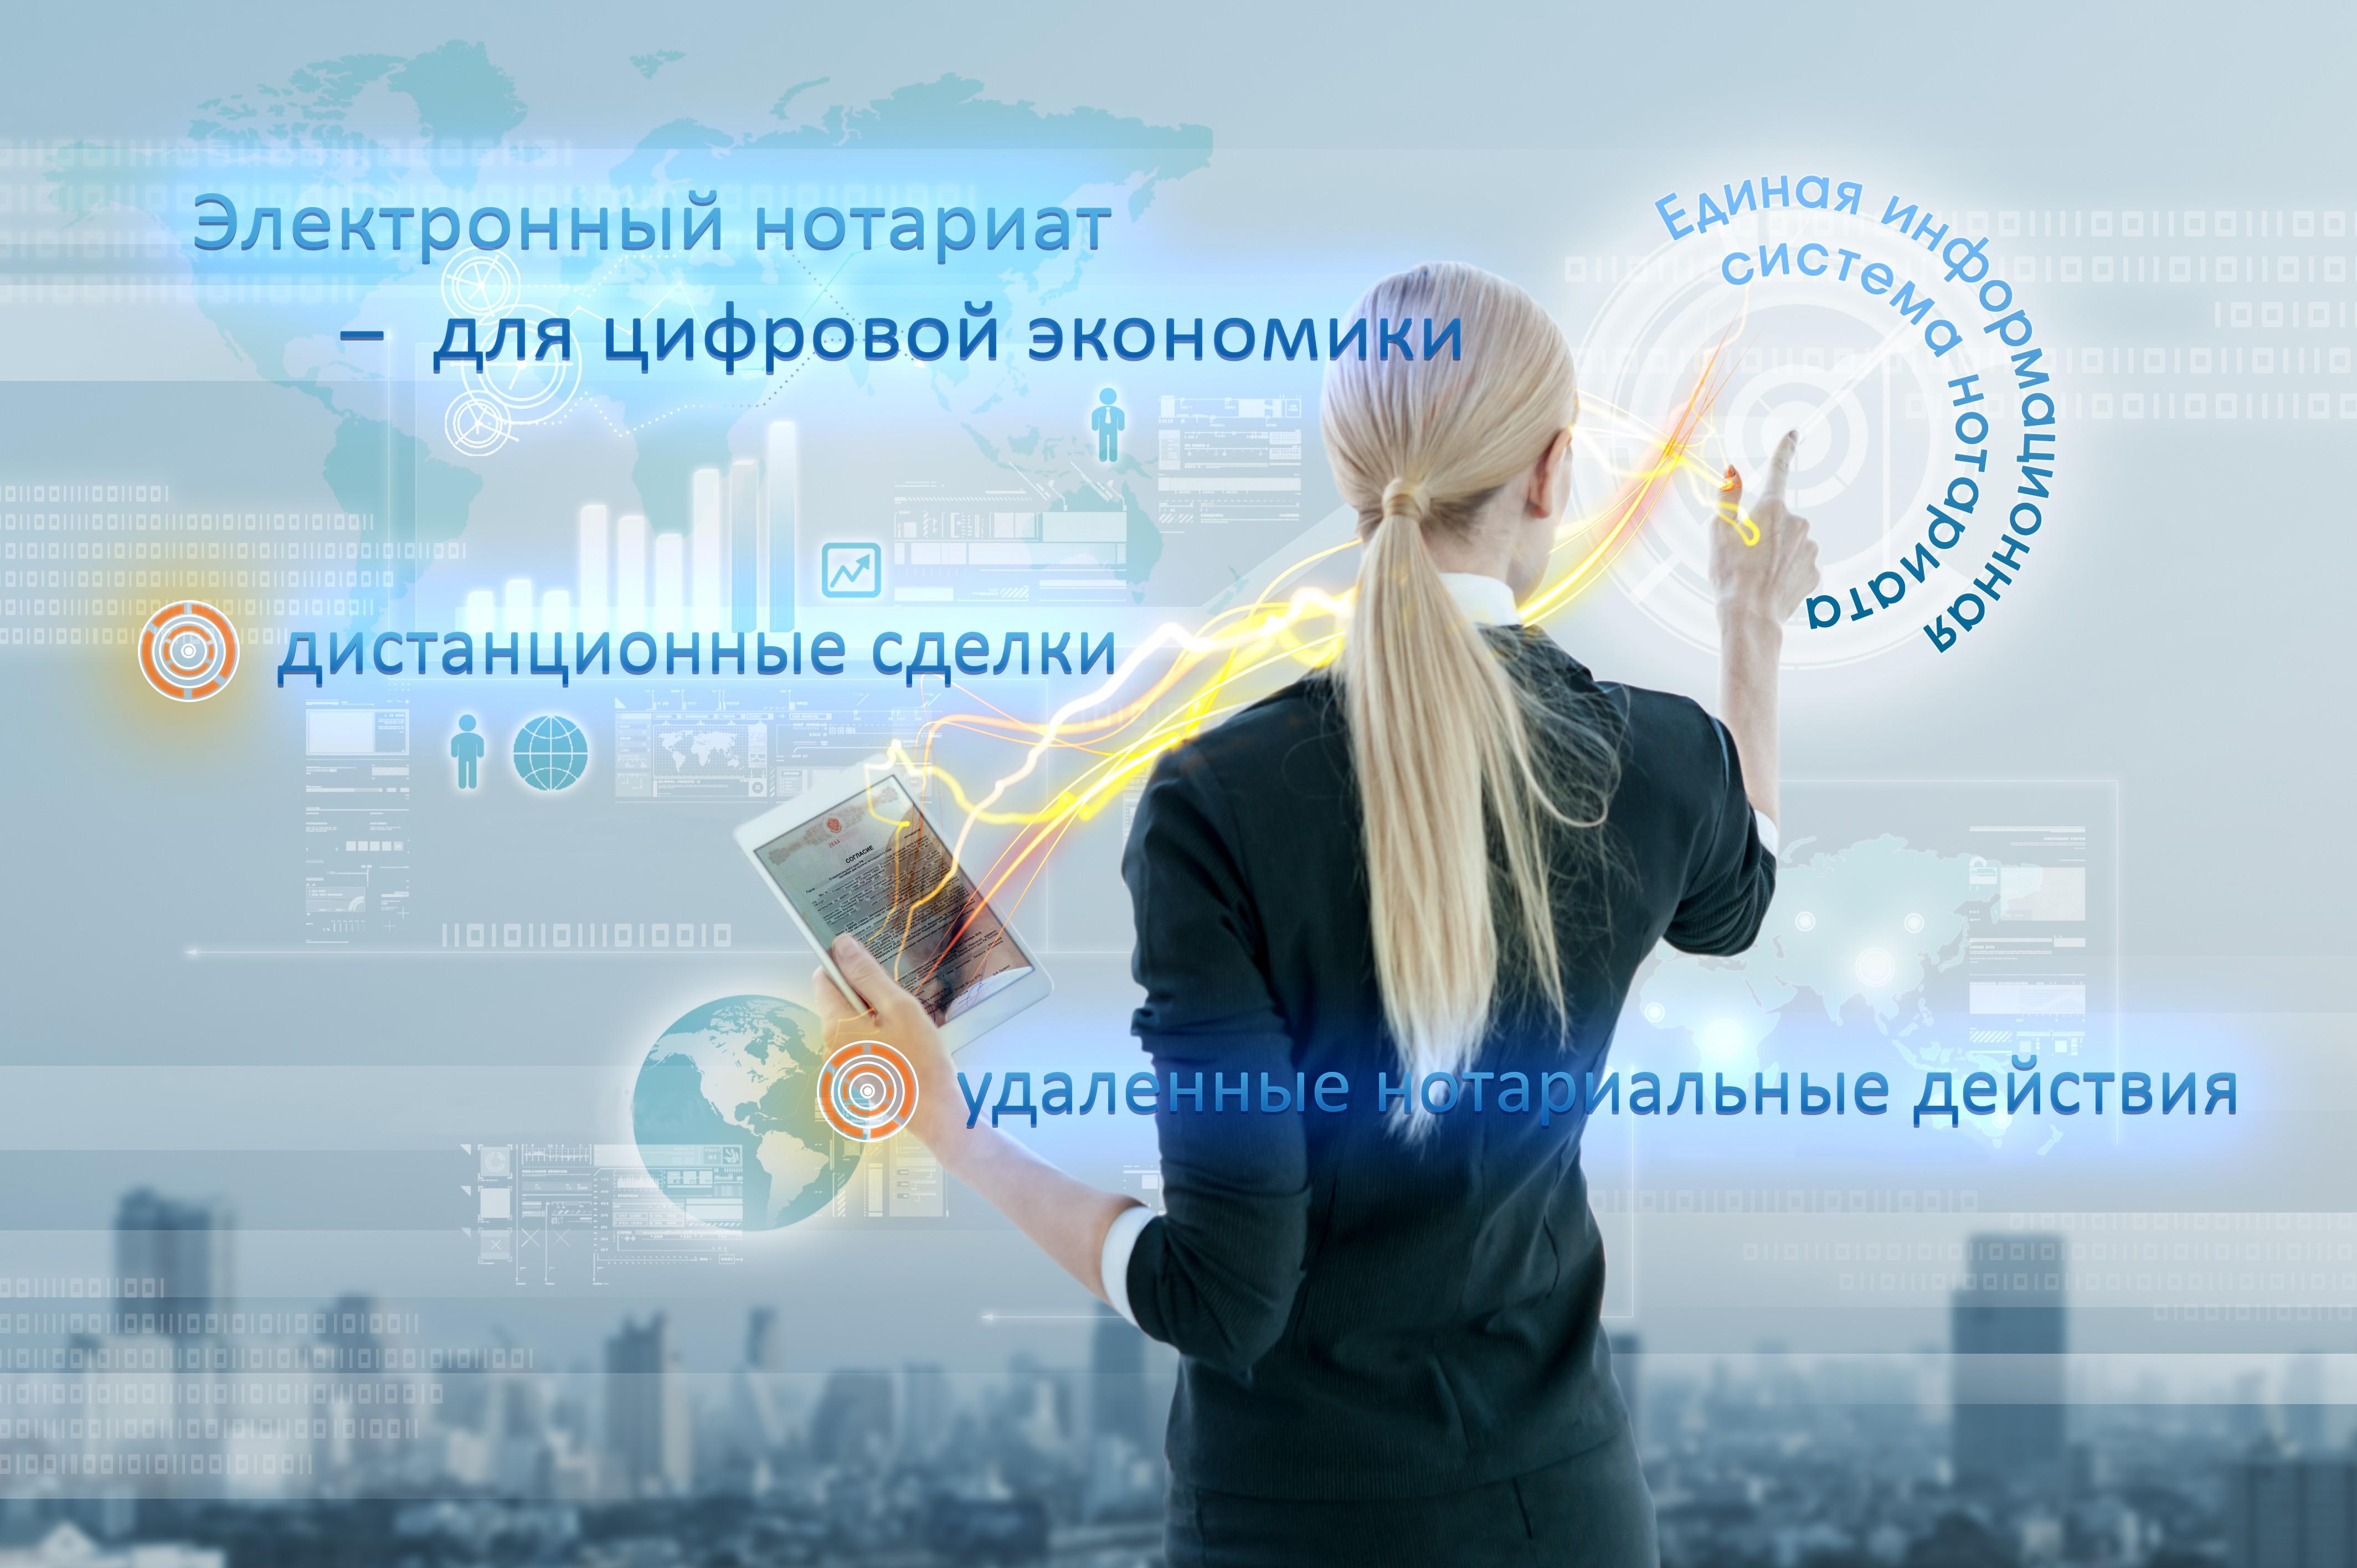 цифровой нотариат картинка знанием